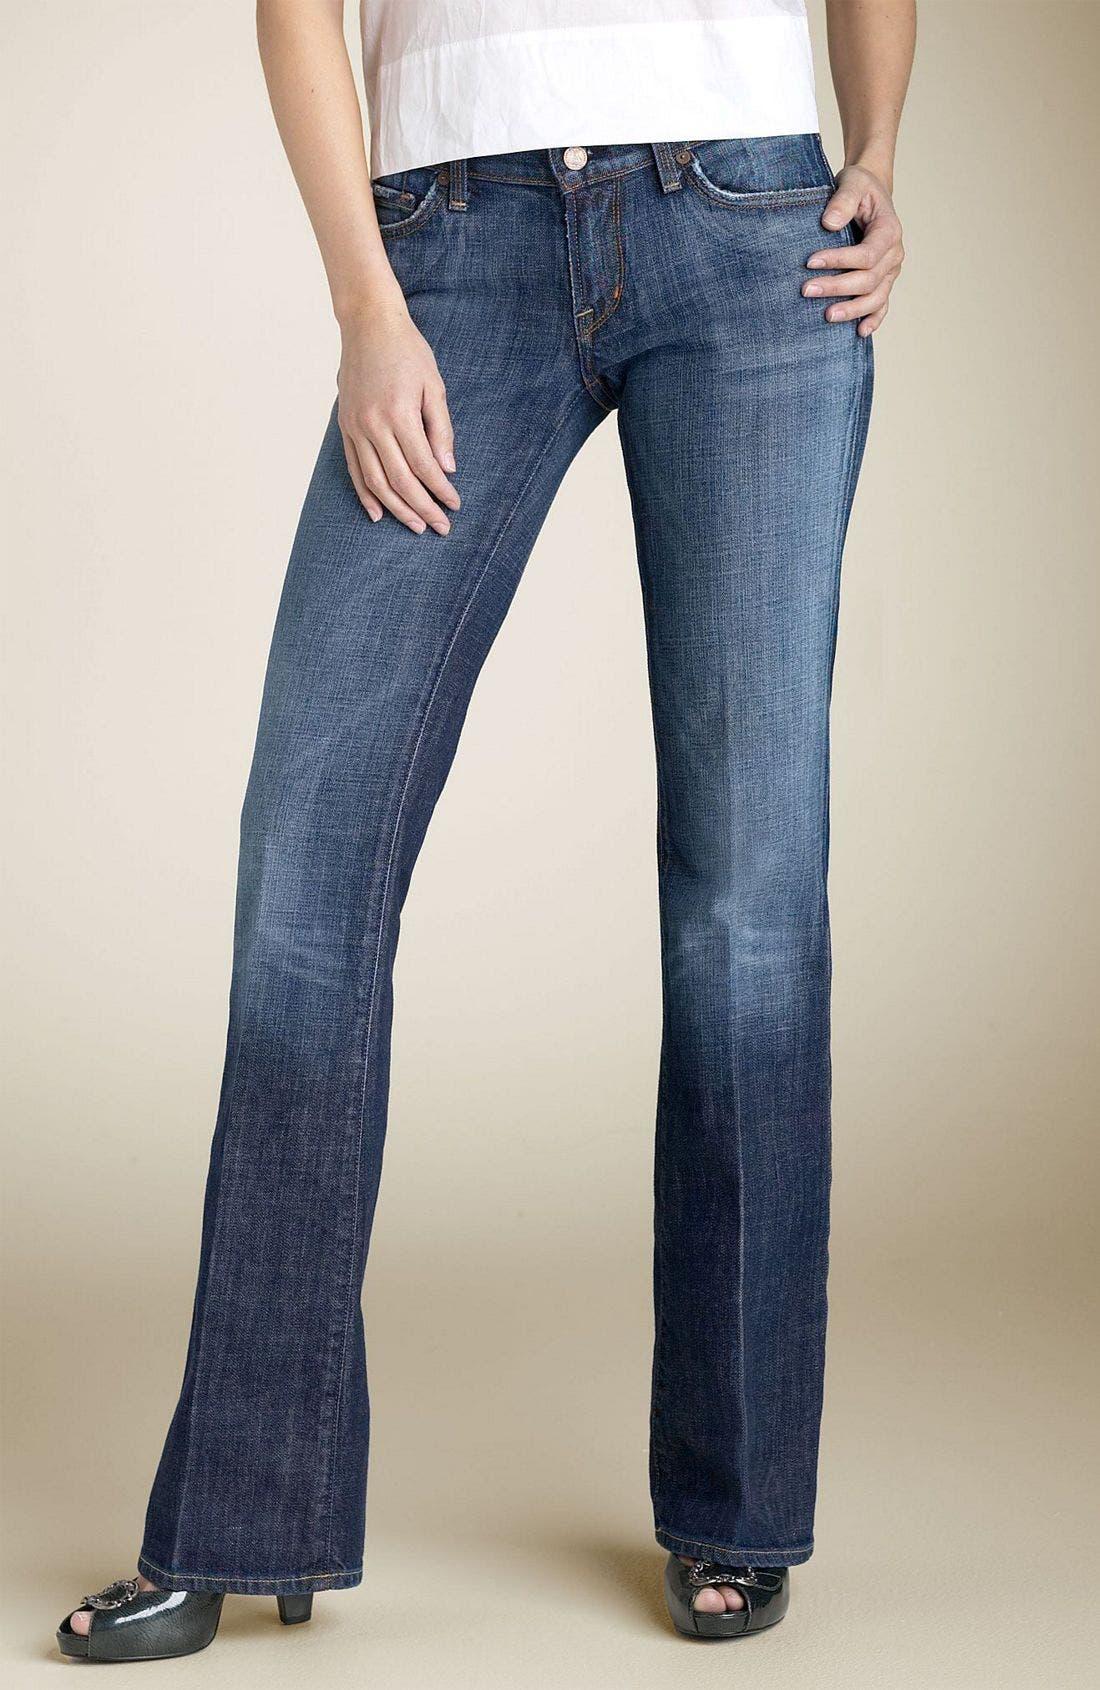 'Dita' Bootcut Stretch Jeans,                             Main thumbnail 1, color,                             404